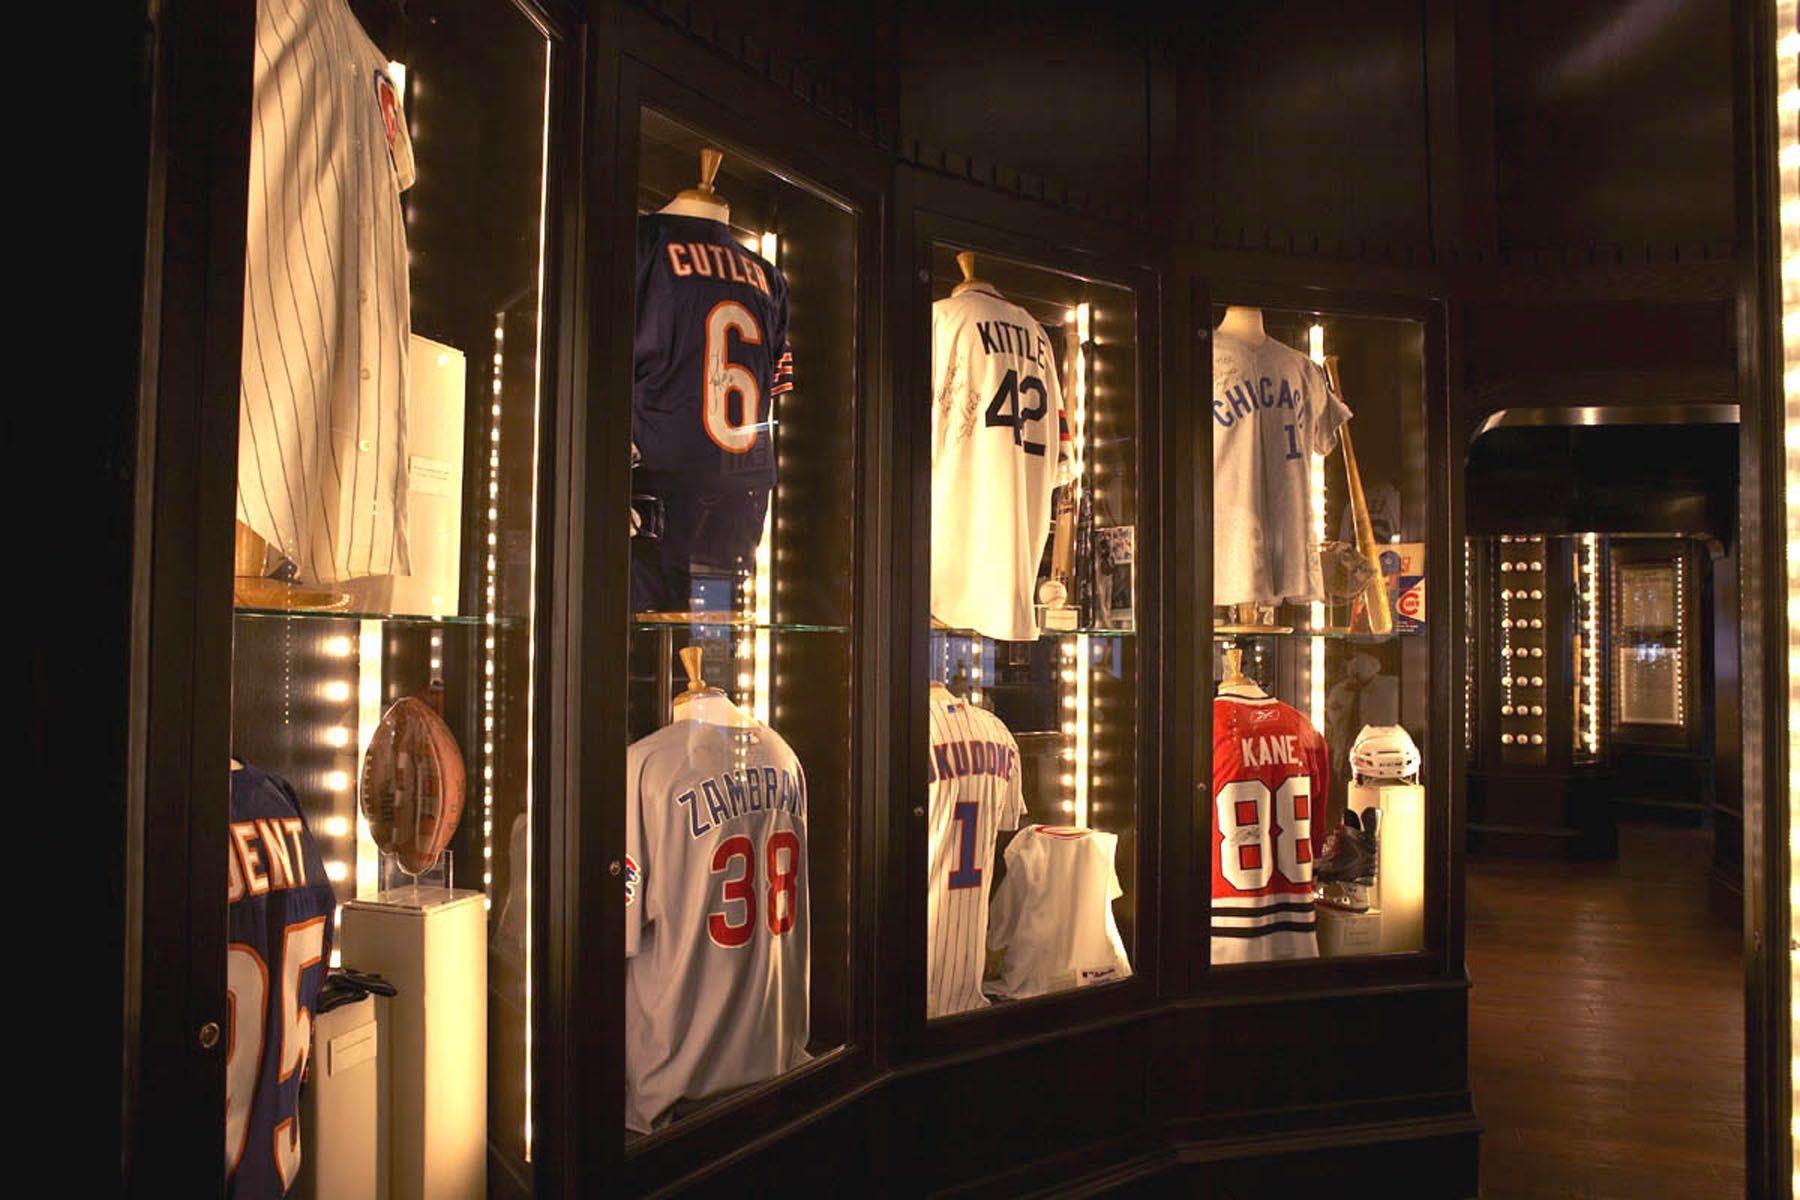 jersey Sports memorabilia room, Sports memorabilia